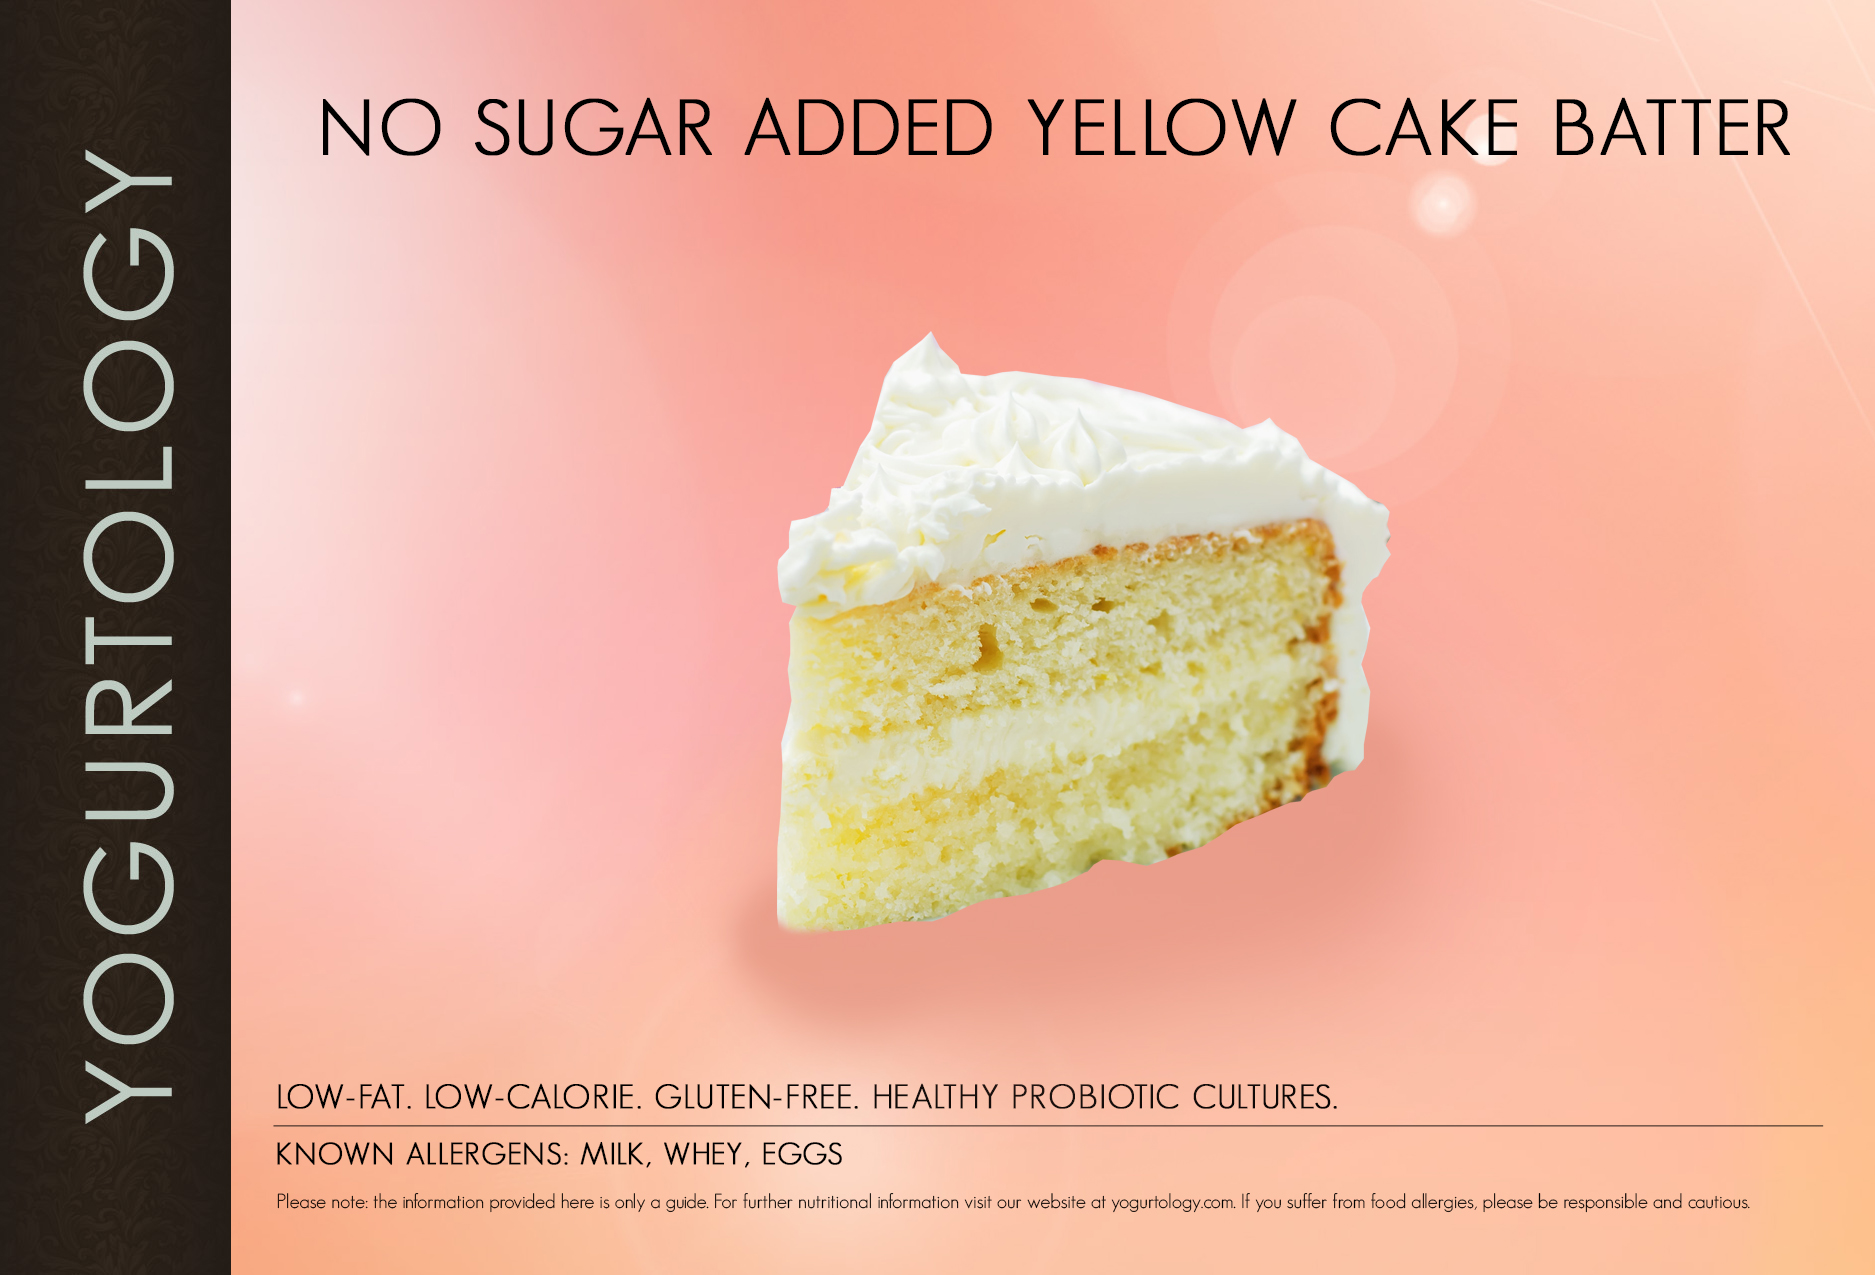 NSA Yellow Cake Batter